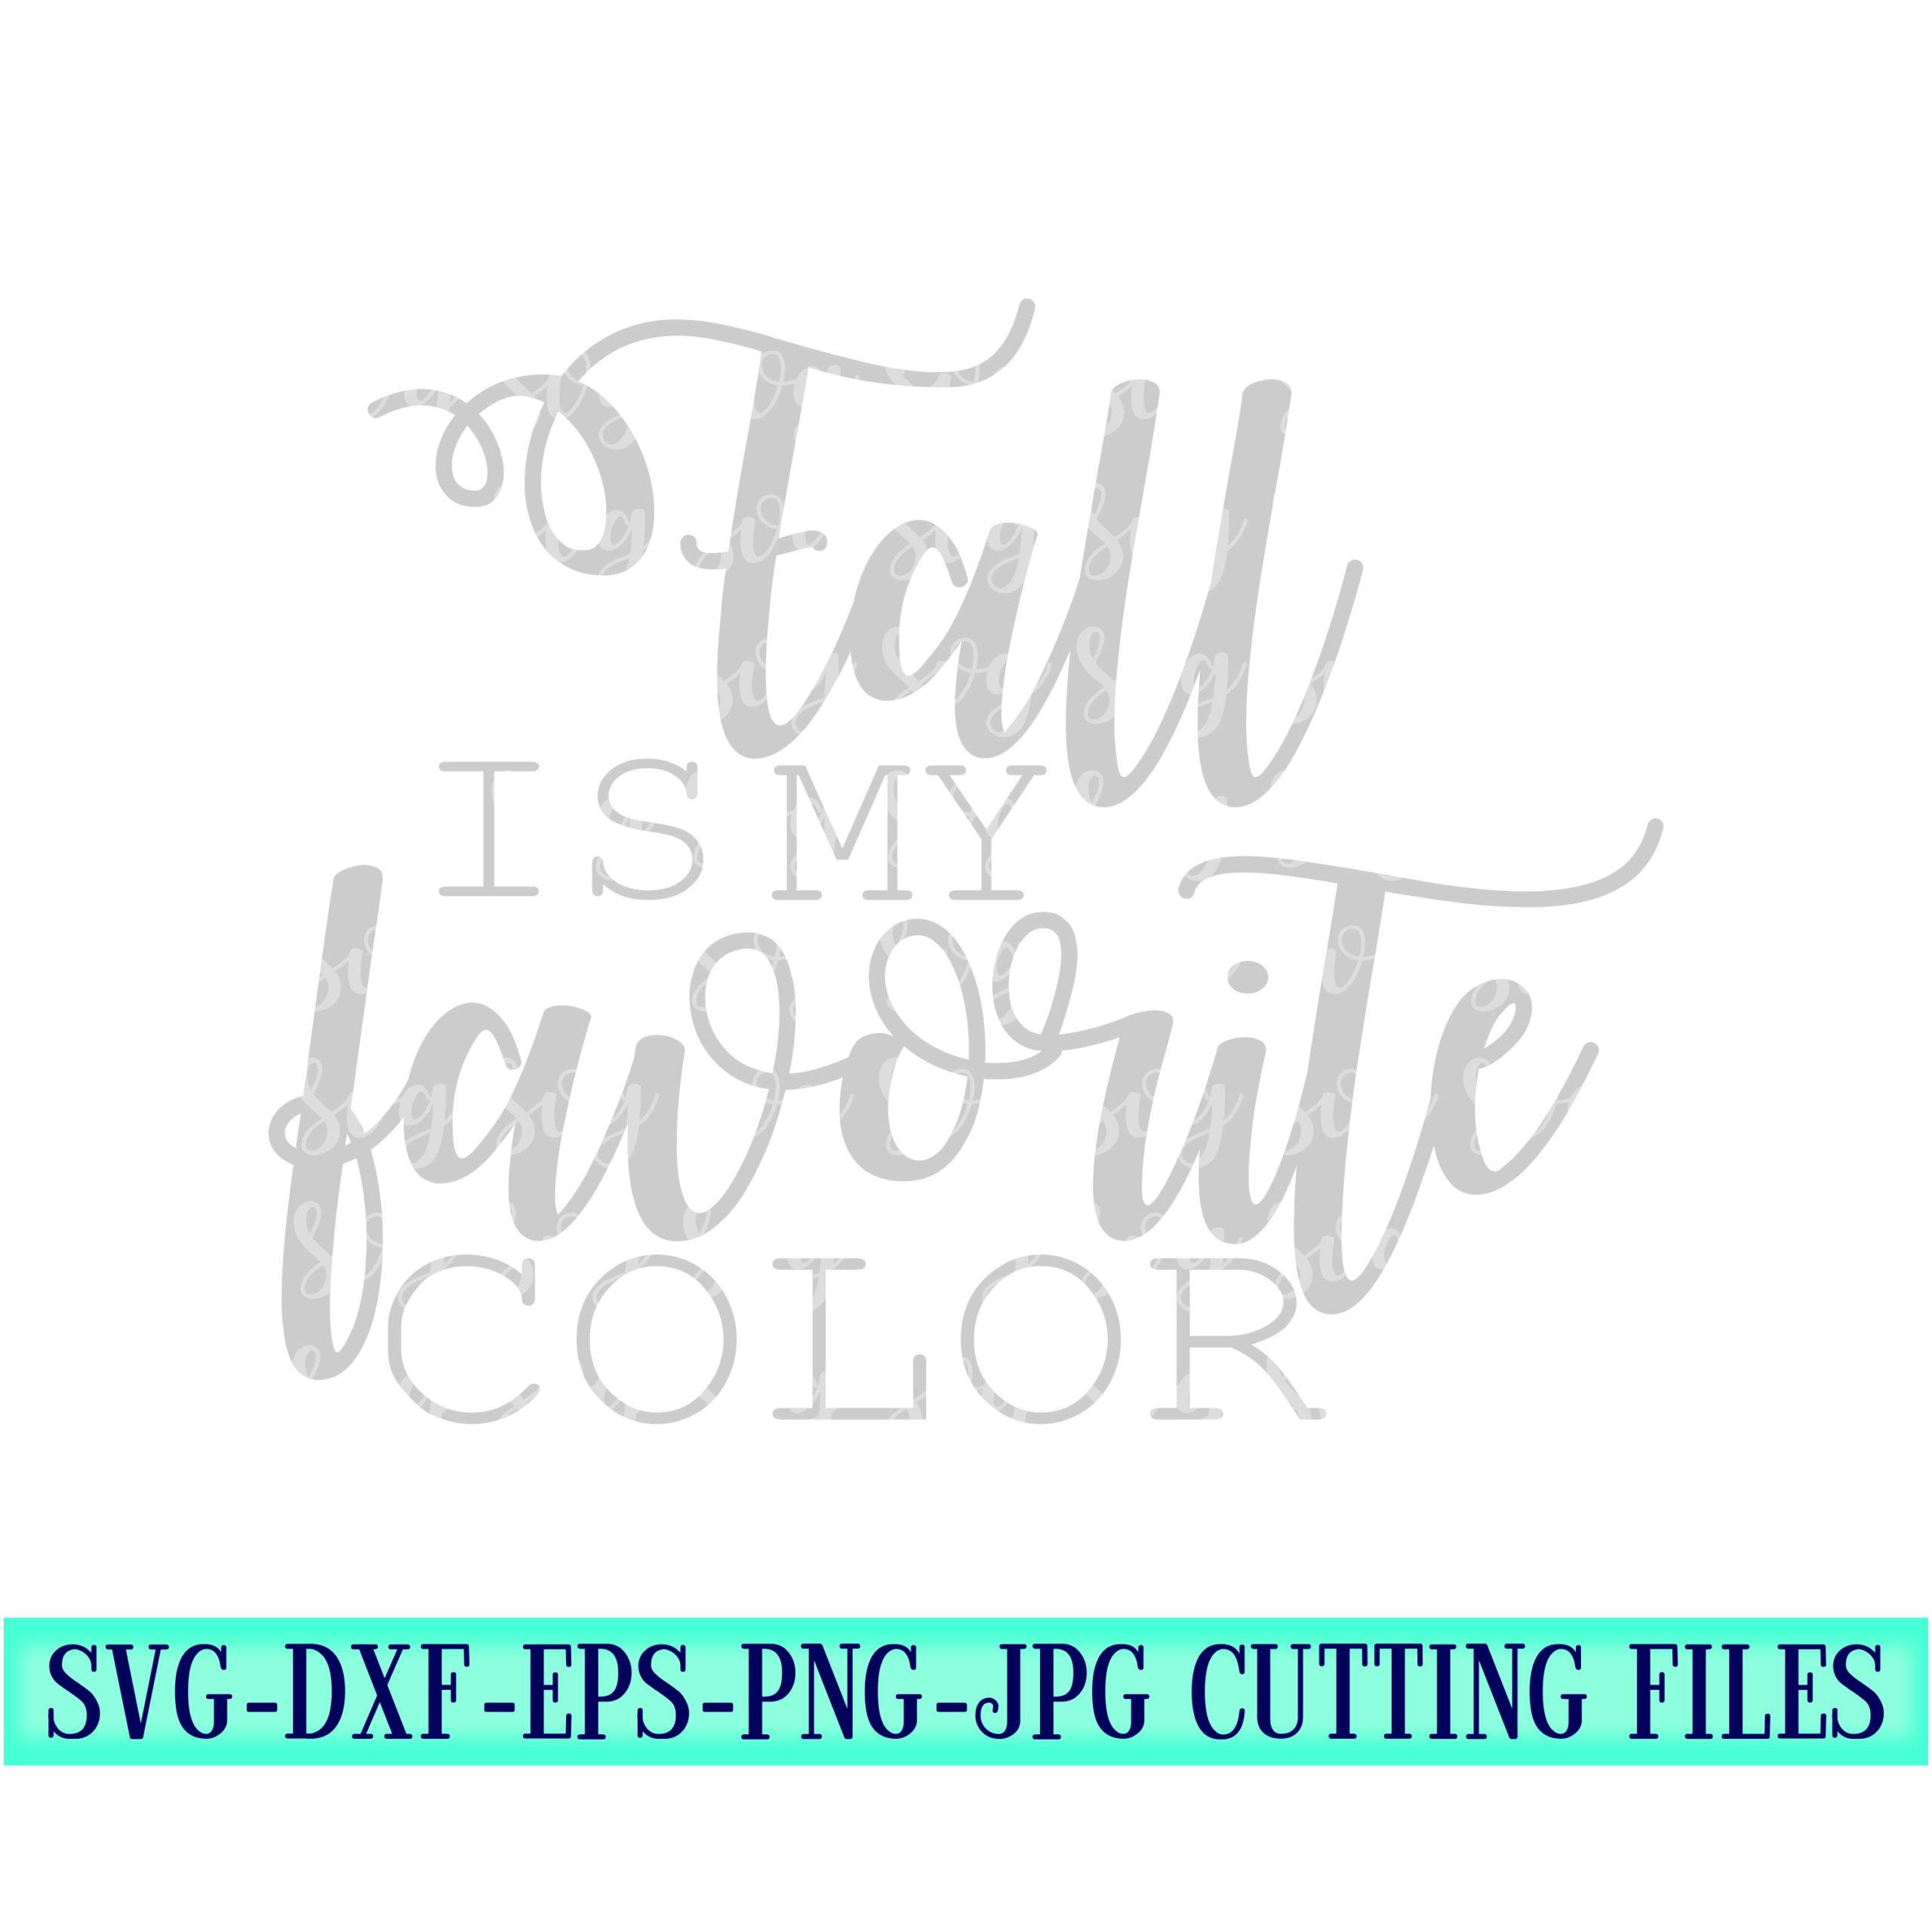 Fall-is-my-favorite-svg-fall-svg-autumn-svg-fall-sayingsfall-svg-designsfall-cut-filescricut-fall-designscricut-svgsvg-for-mobile-5f6f717c